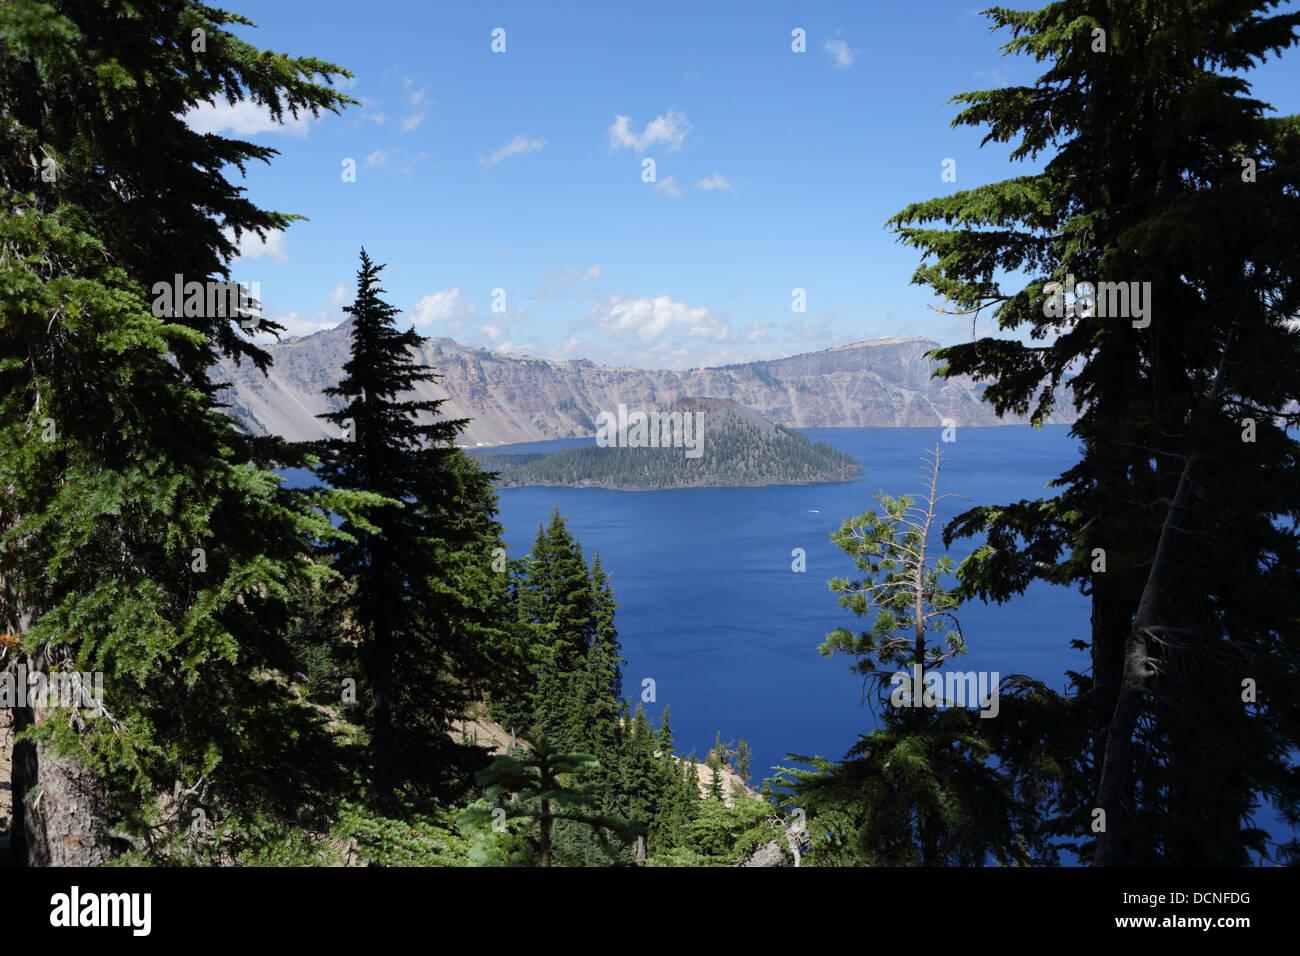 Crater Lake, Oregon, USA - Stock Image